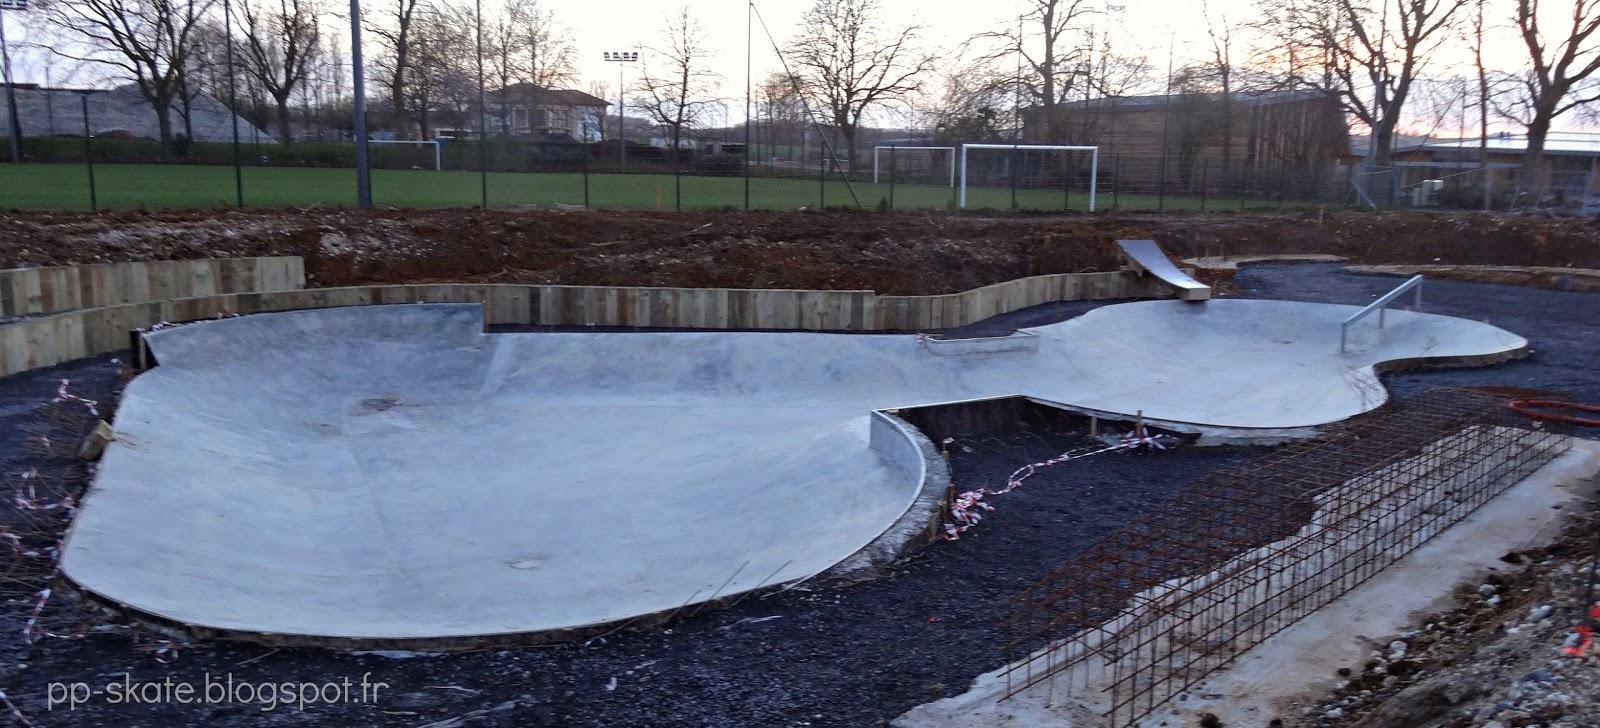 skatepark bowl bruay la buissiere